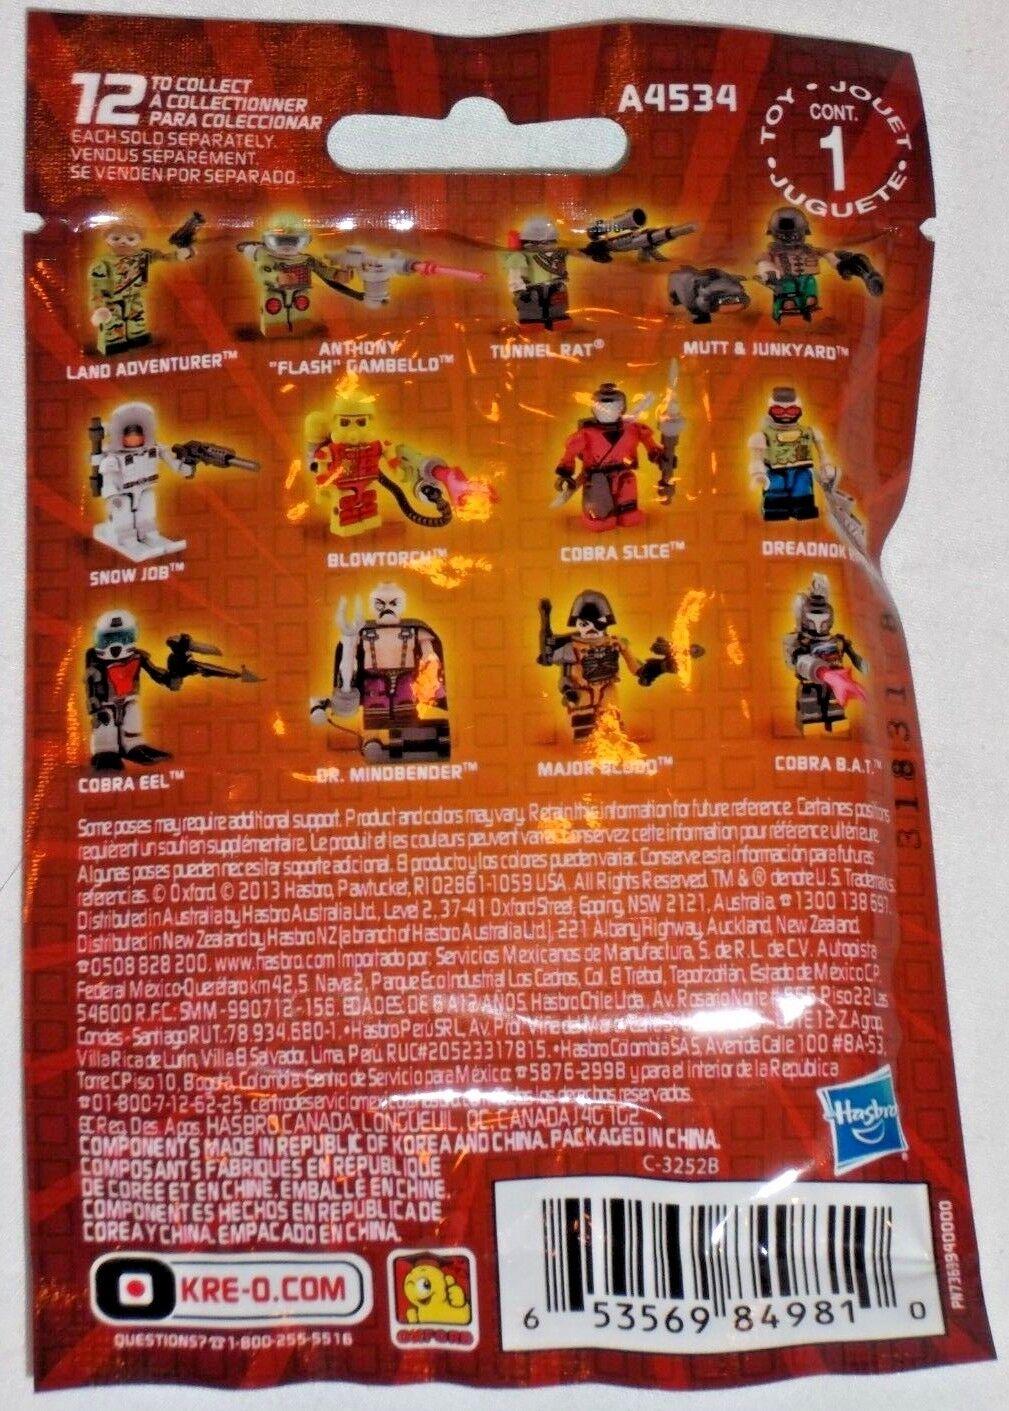 HASBRO GI JOE KRE-O KRE-O KRE-O Complete Collection 2 x12 Minifigure Action Figure BLIND BAG b4e0c7